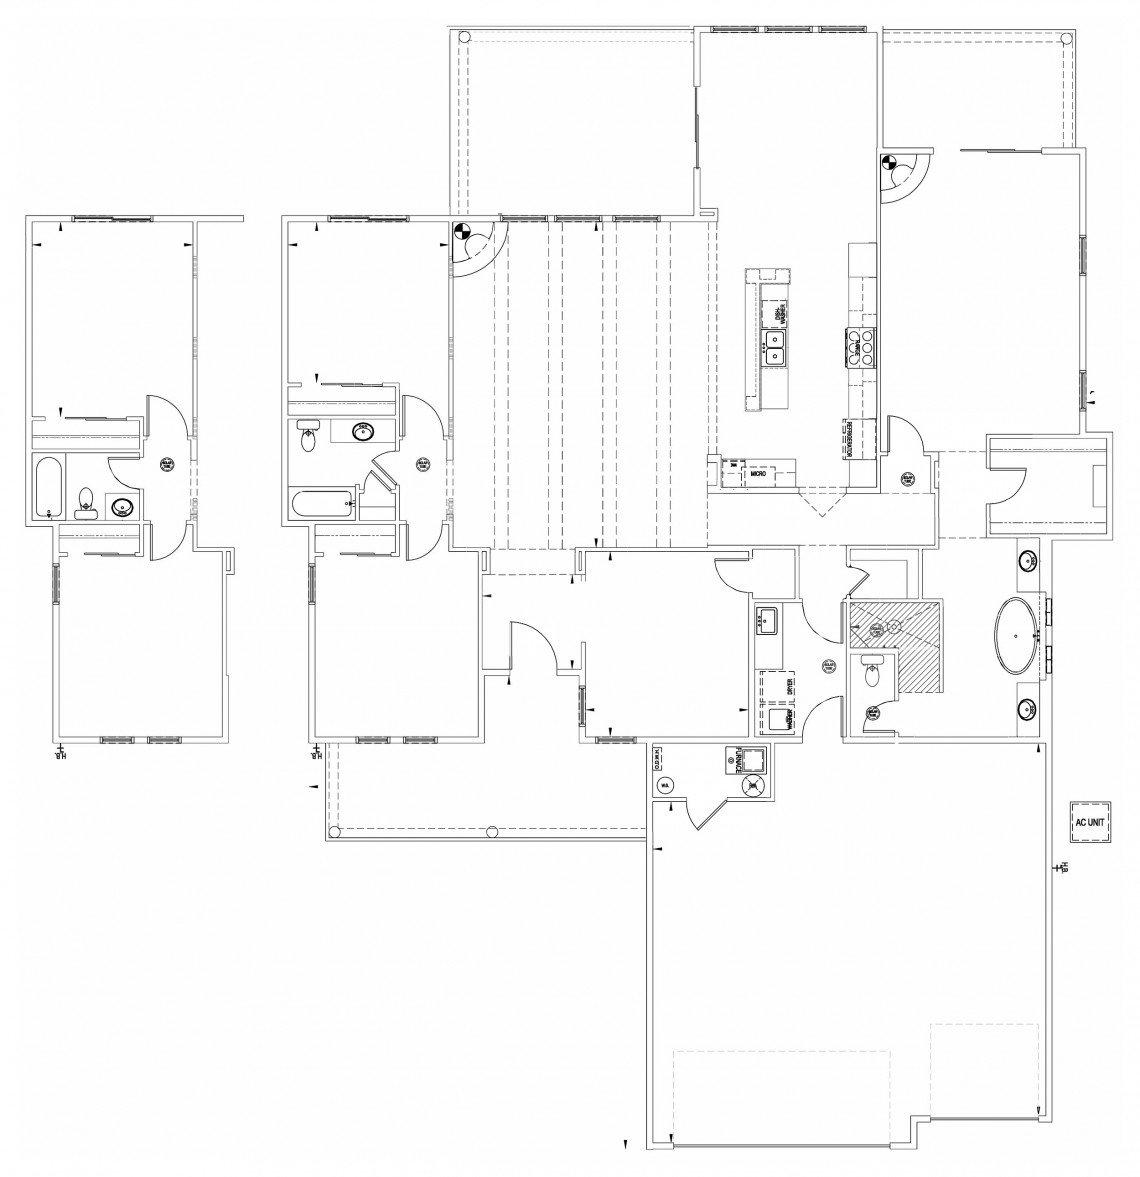 Calico Rose Floorplan - 2,500 sq ft